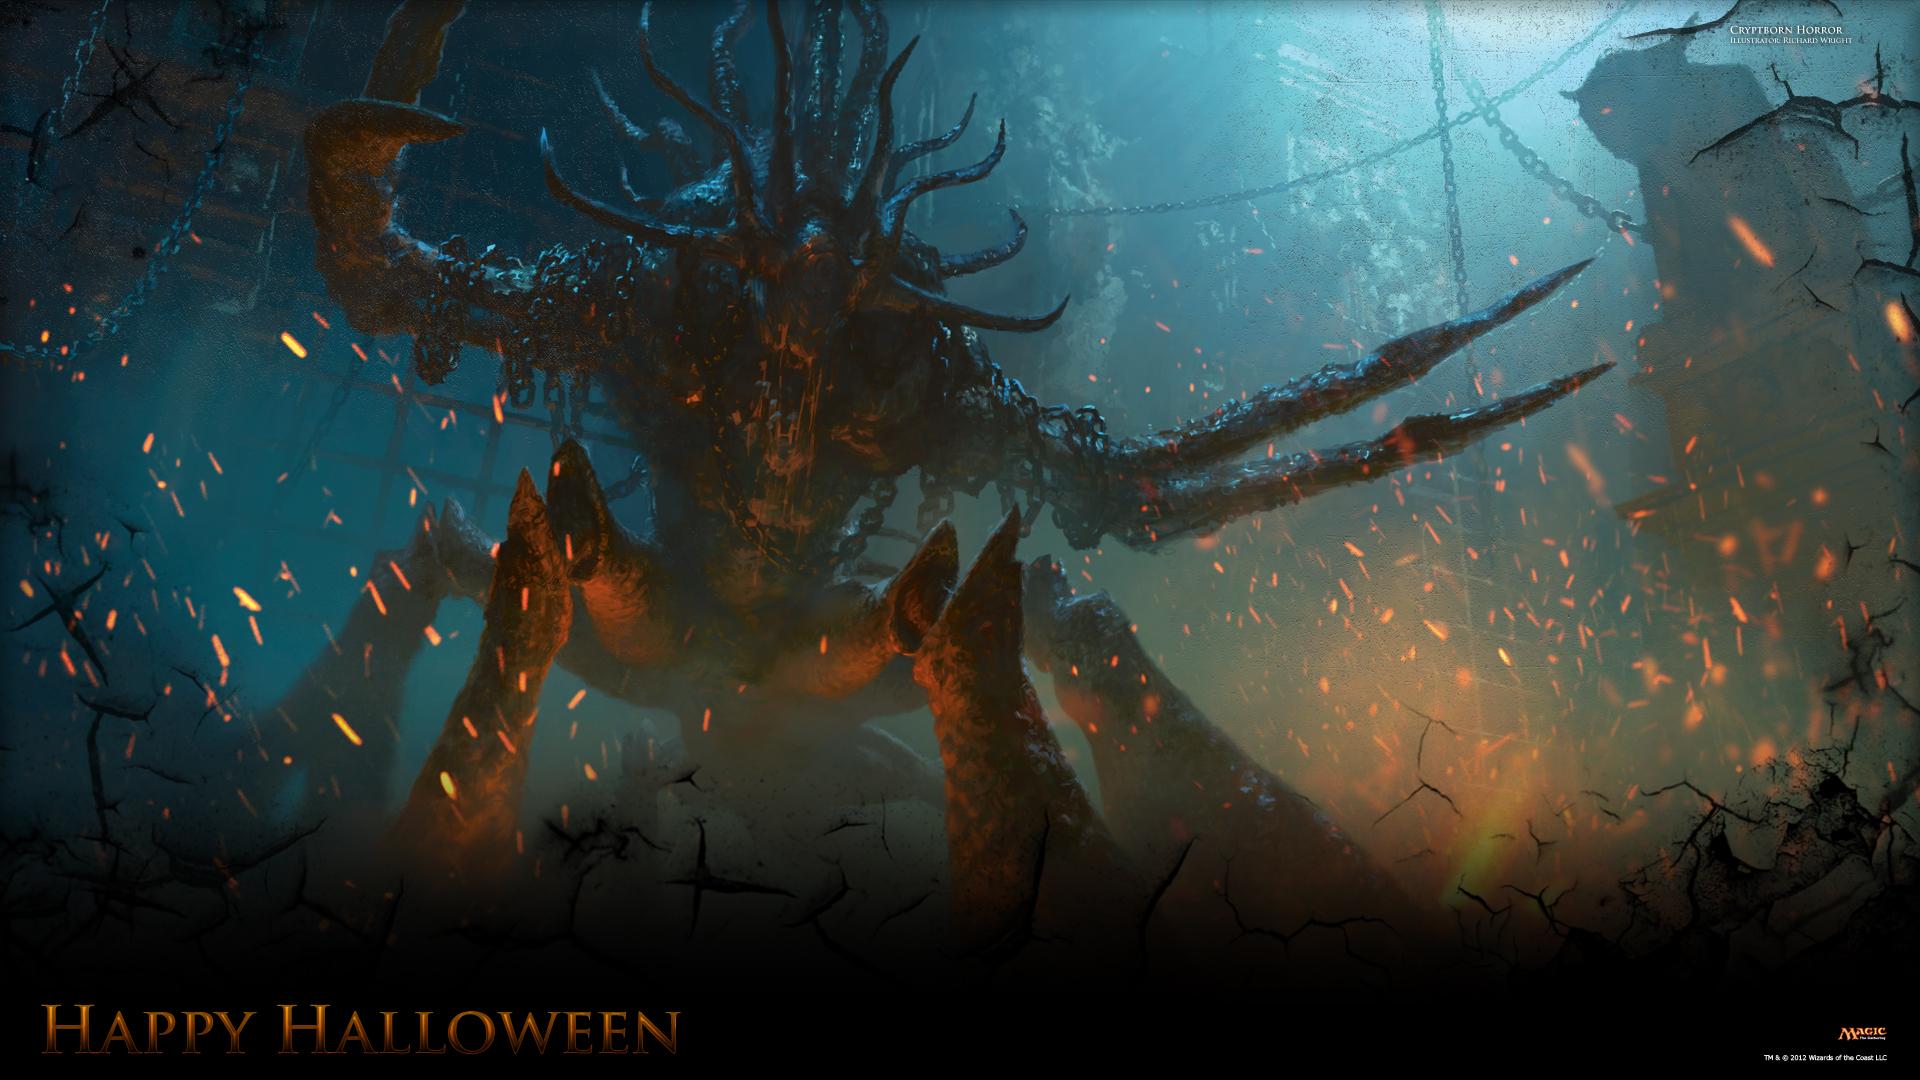 Secret Wallpaper Of The Week Halloween 2012